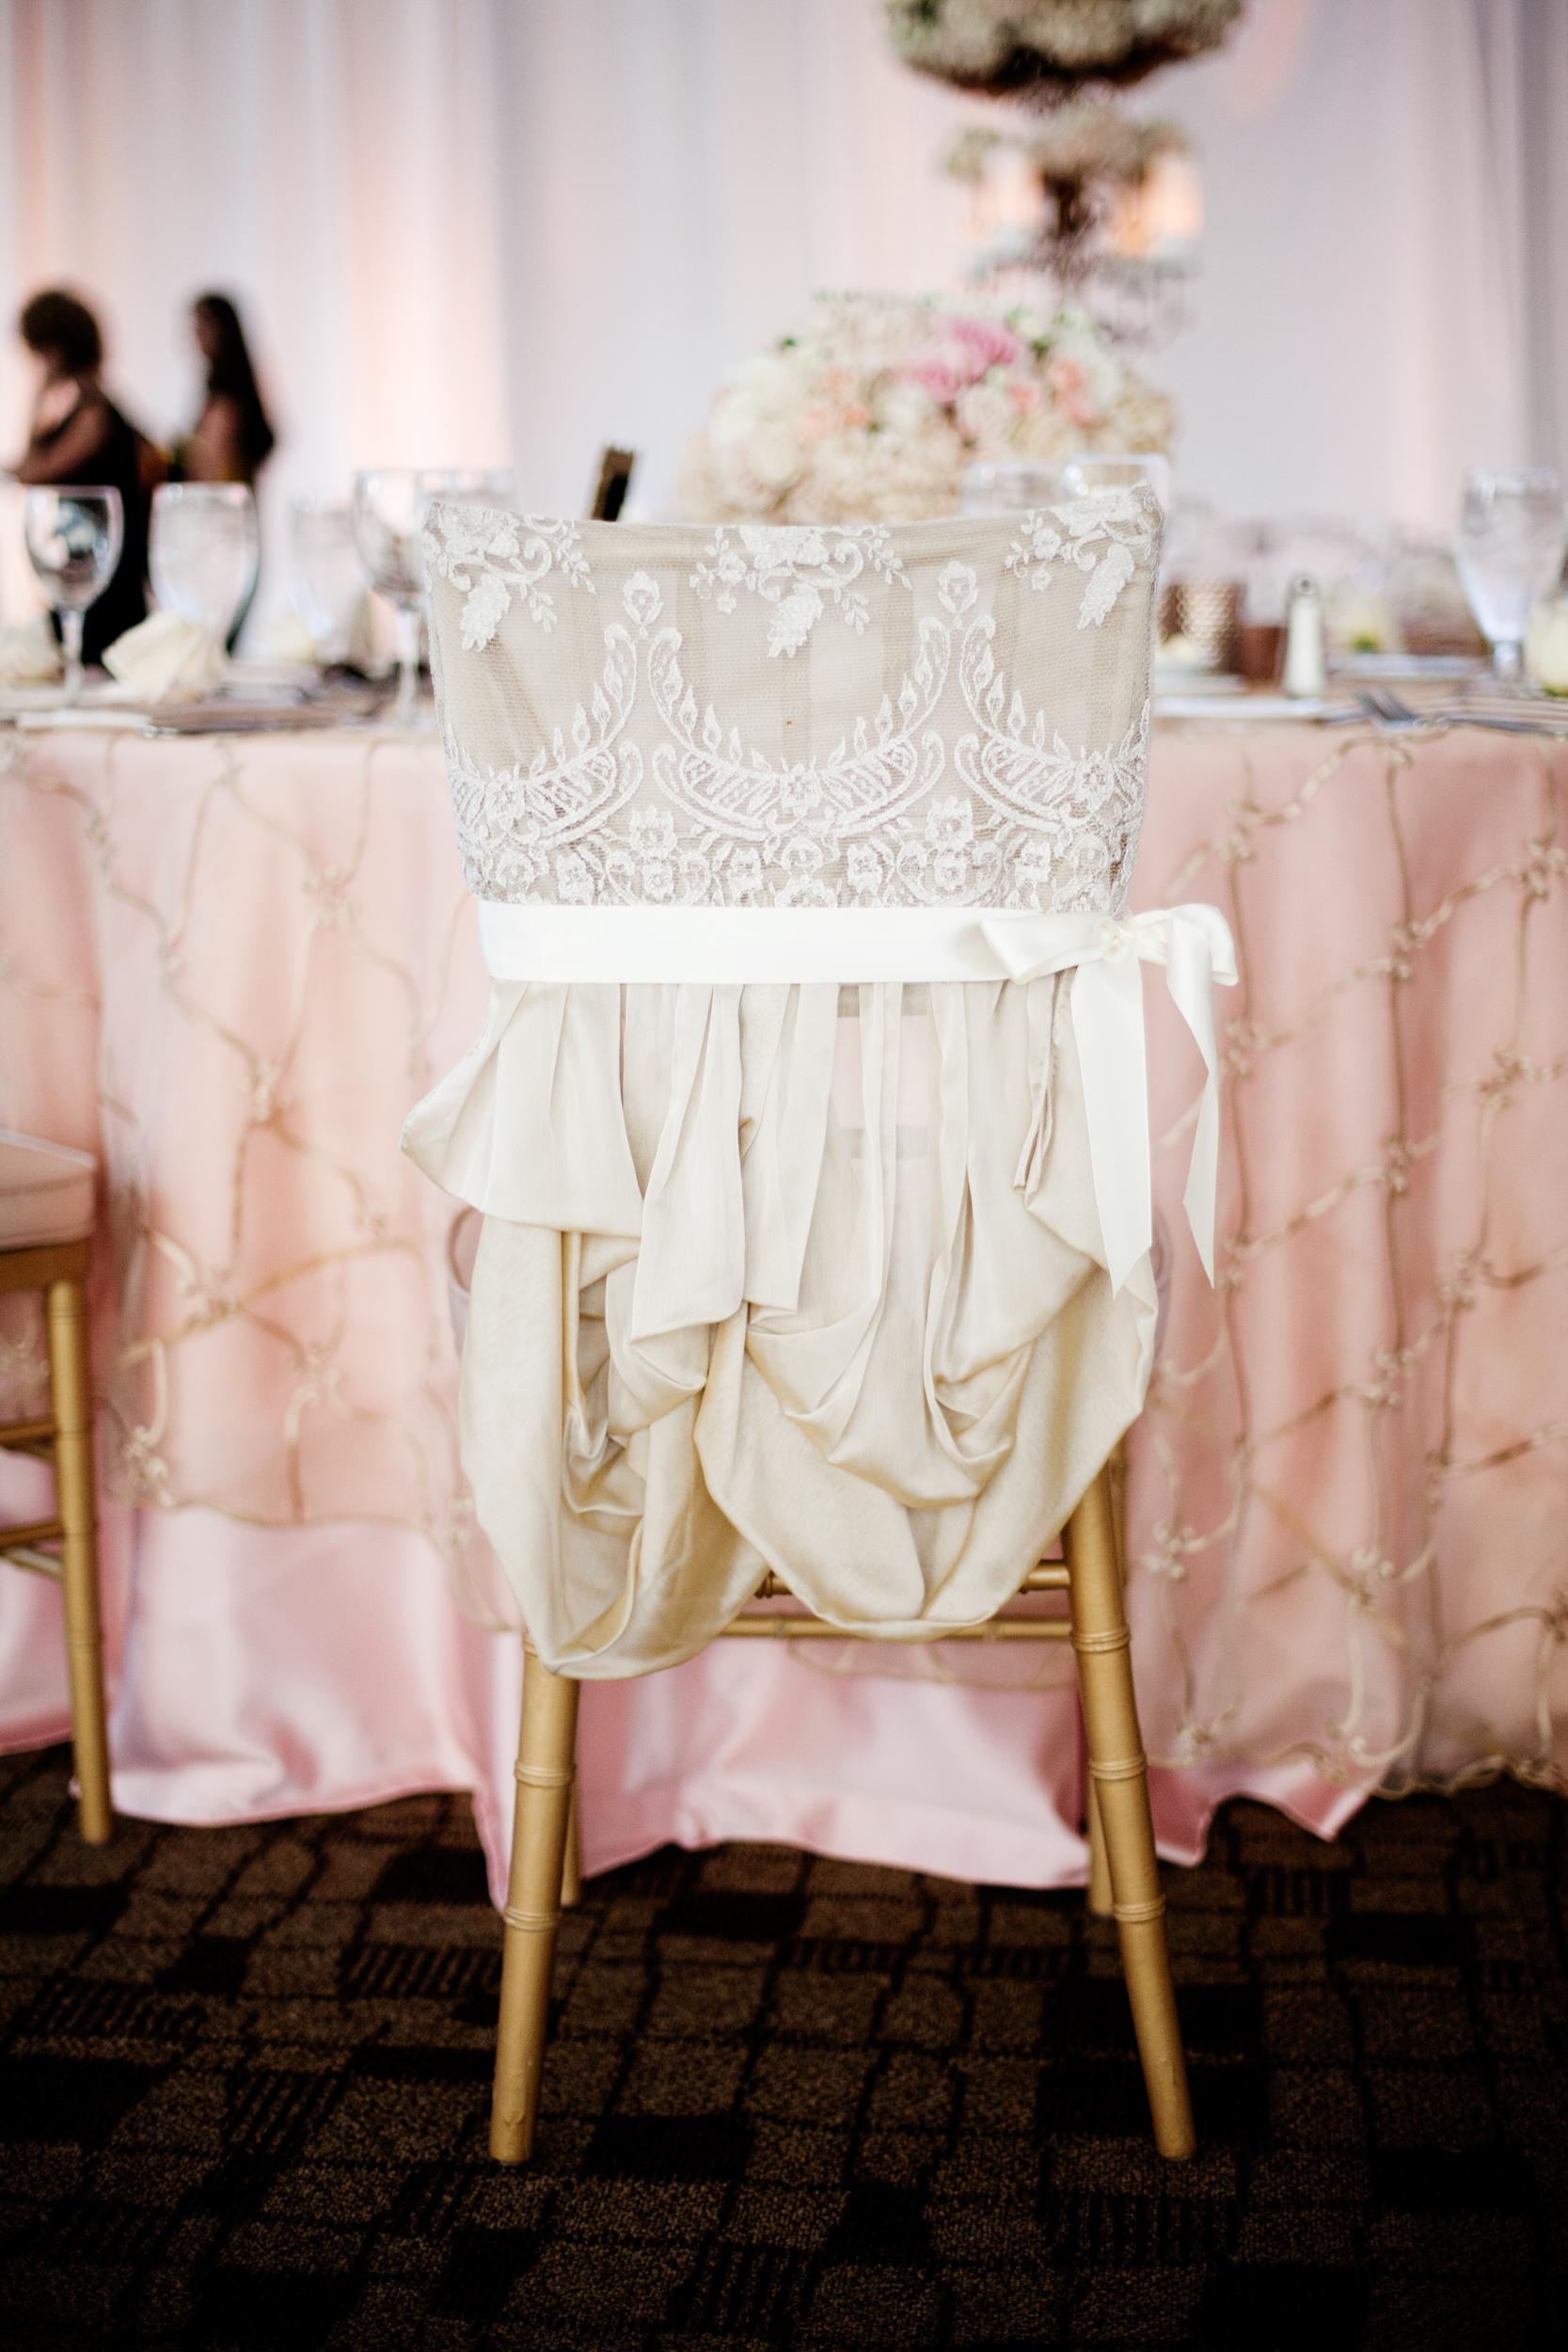 Ceci_New_York_Ceci_Style_Ceci_Johnson_Luxury_Lifestyle_Floral_Lace_Wedding_Letterpress_Inspiration_Design_Custom_Couture_Personalized_Invitations_-107.jpg